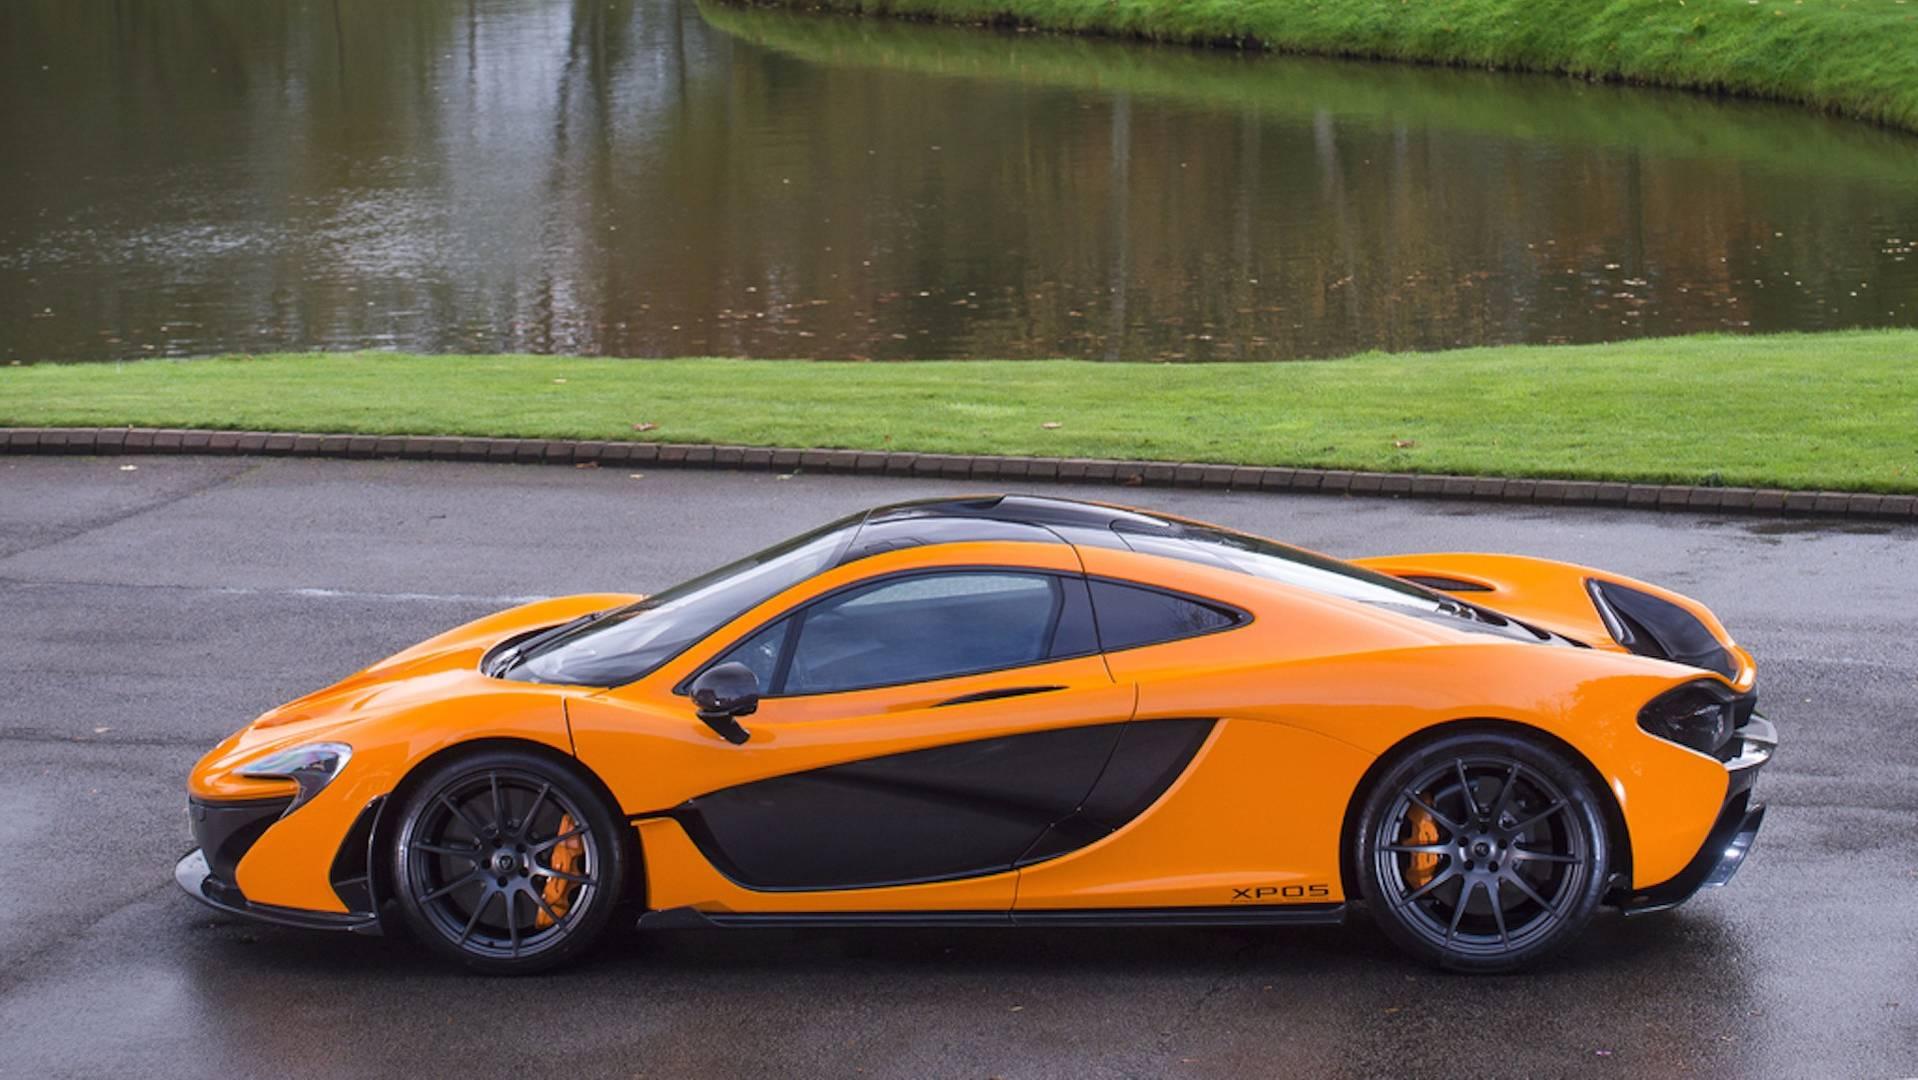 McLaren_P1_Experimental_Prototype_09